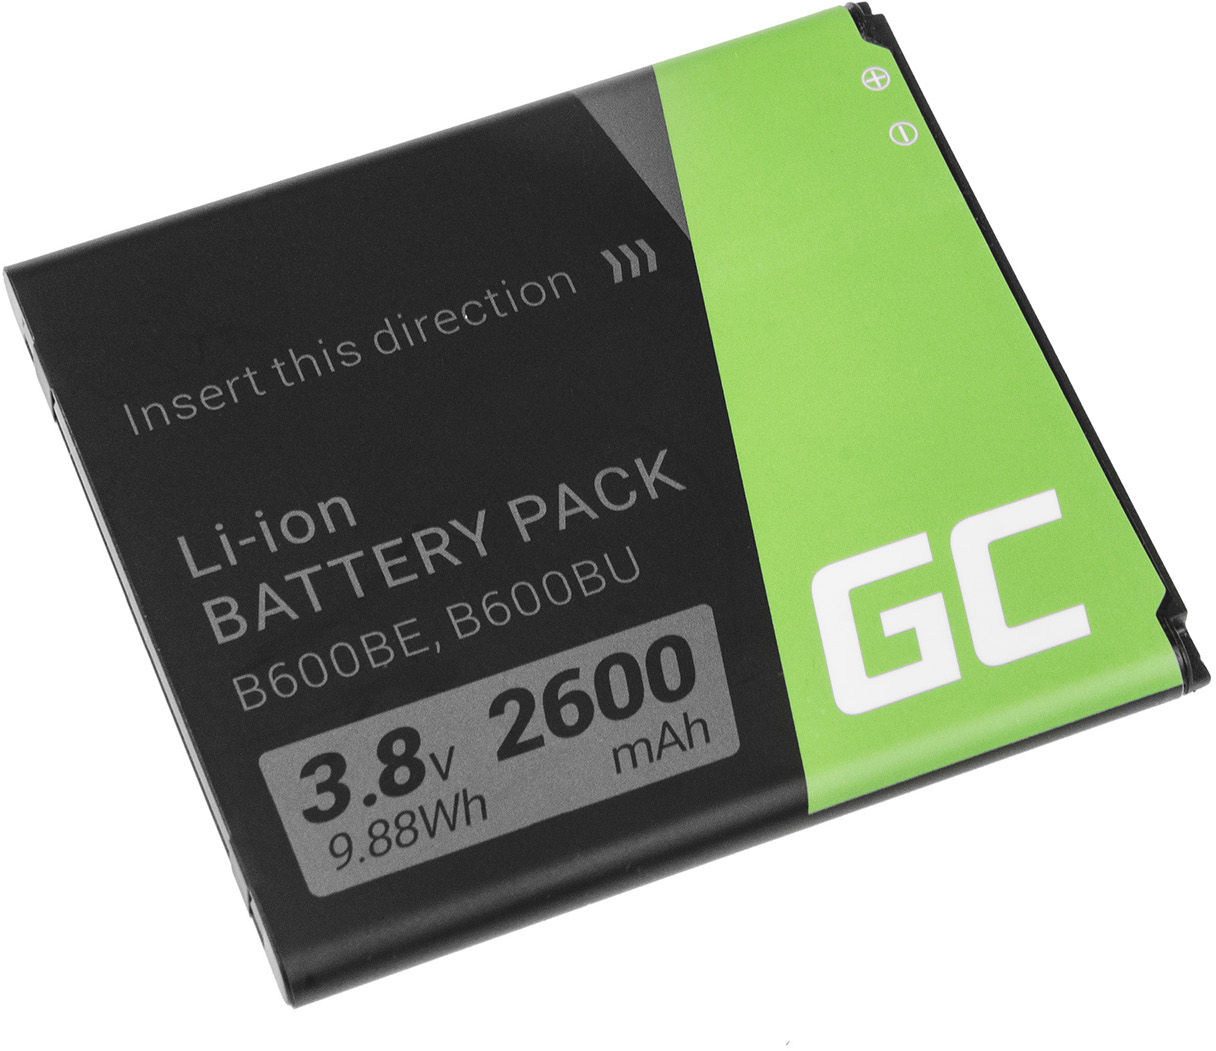 Bateria Green Cell B600BE do telefonu Samsung Galaxy SIV S4 i9505 i9506 G7105